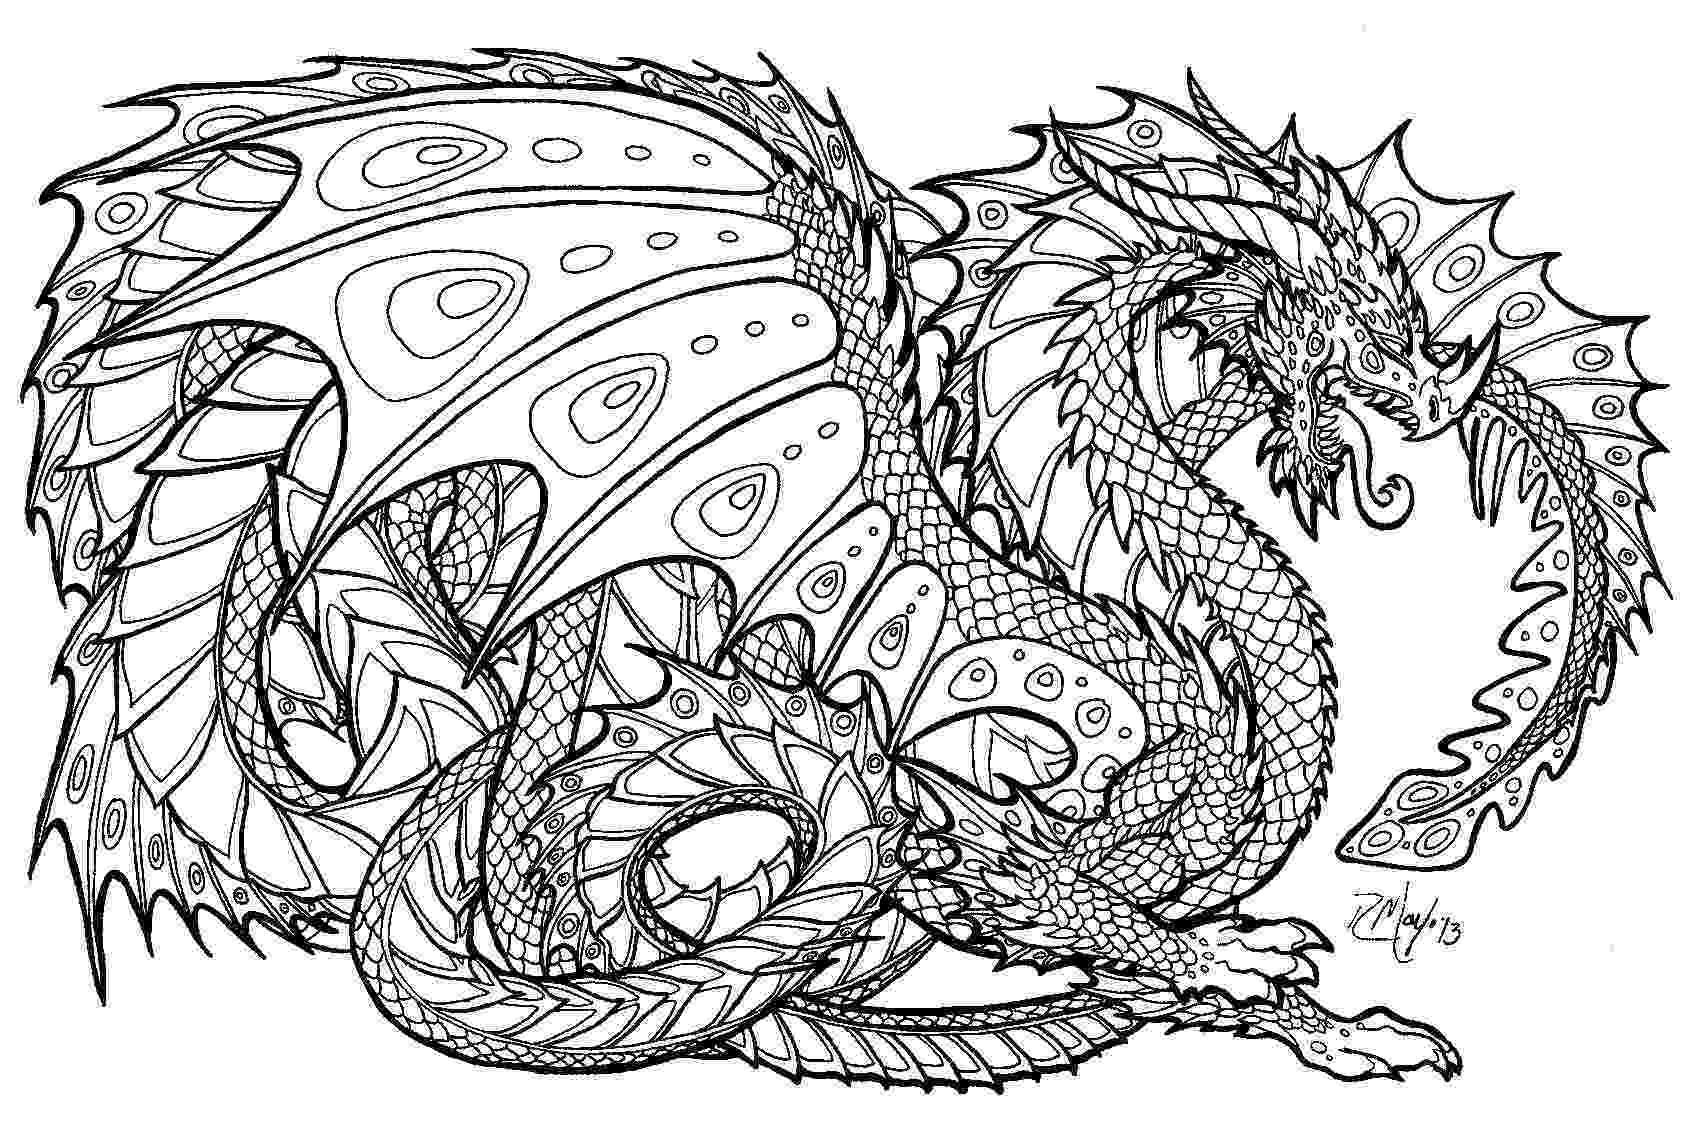 dragon coloring sheet top 25 free printable dragon coloring pages online dragon sheet coloring